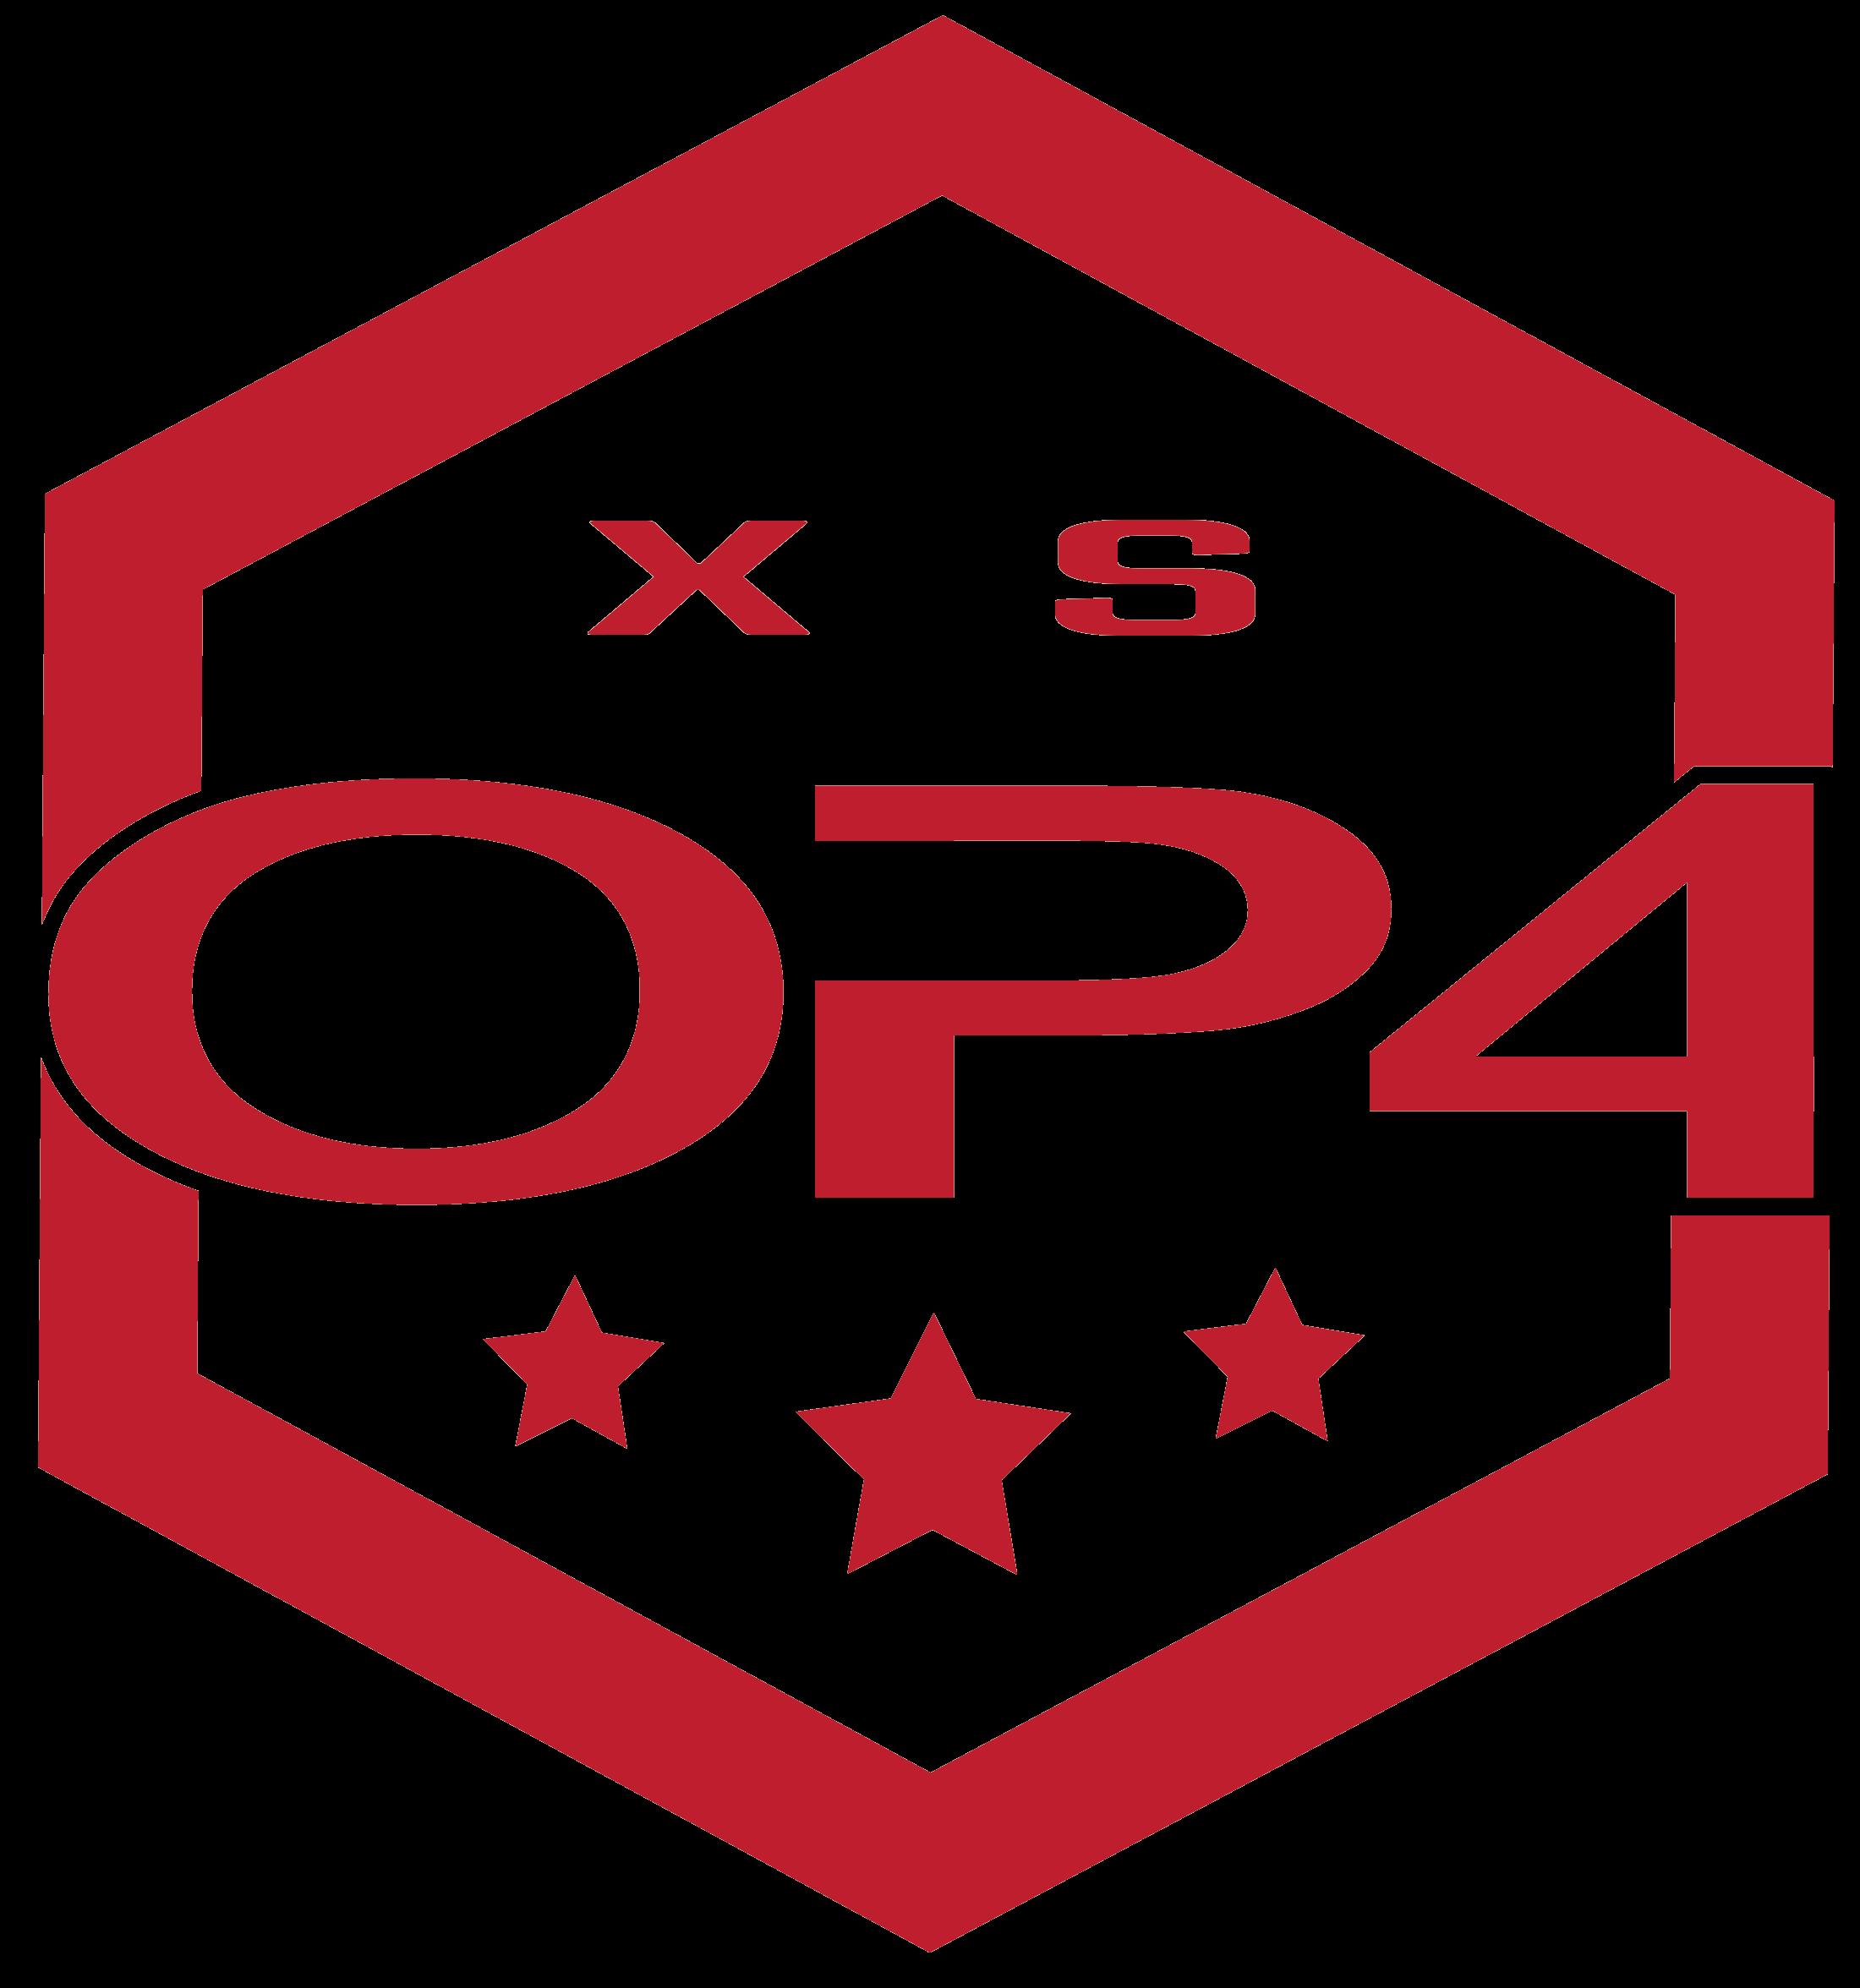 Extra Specialists OPFOR Logo